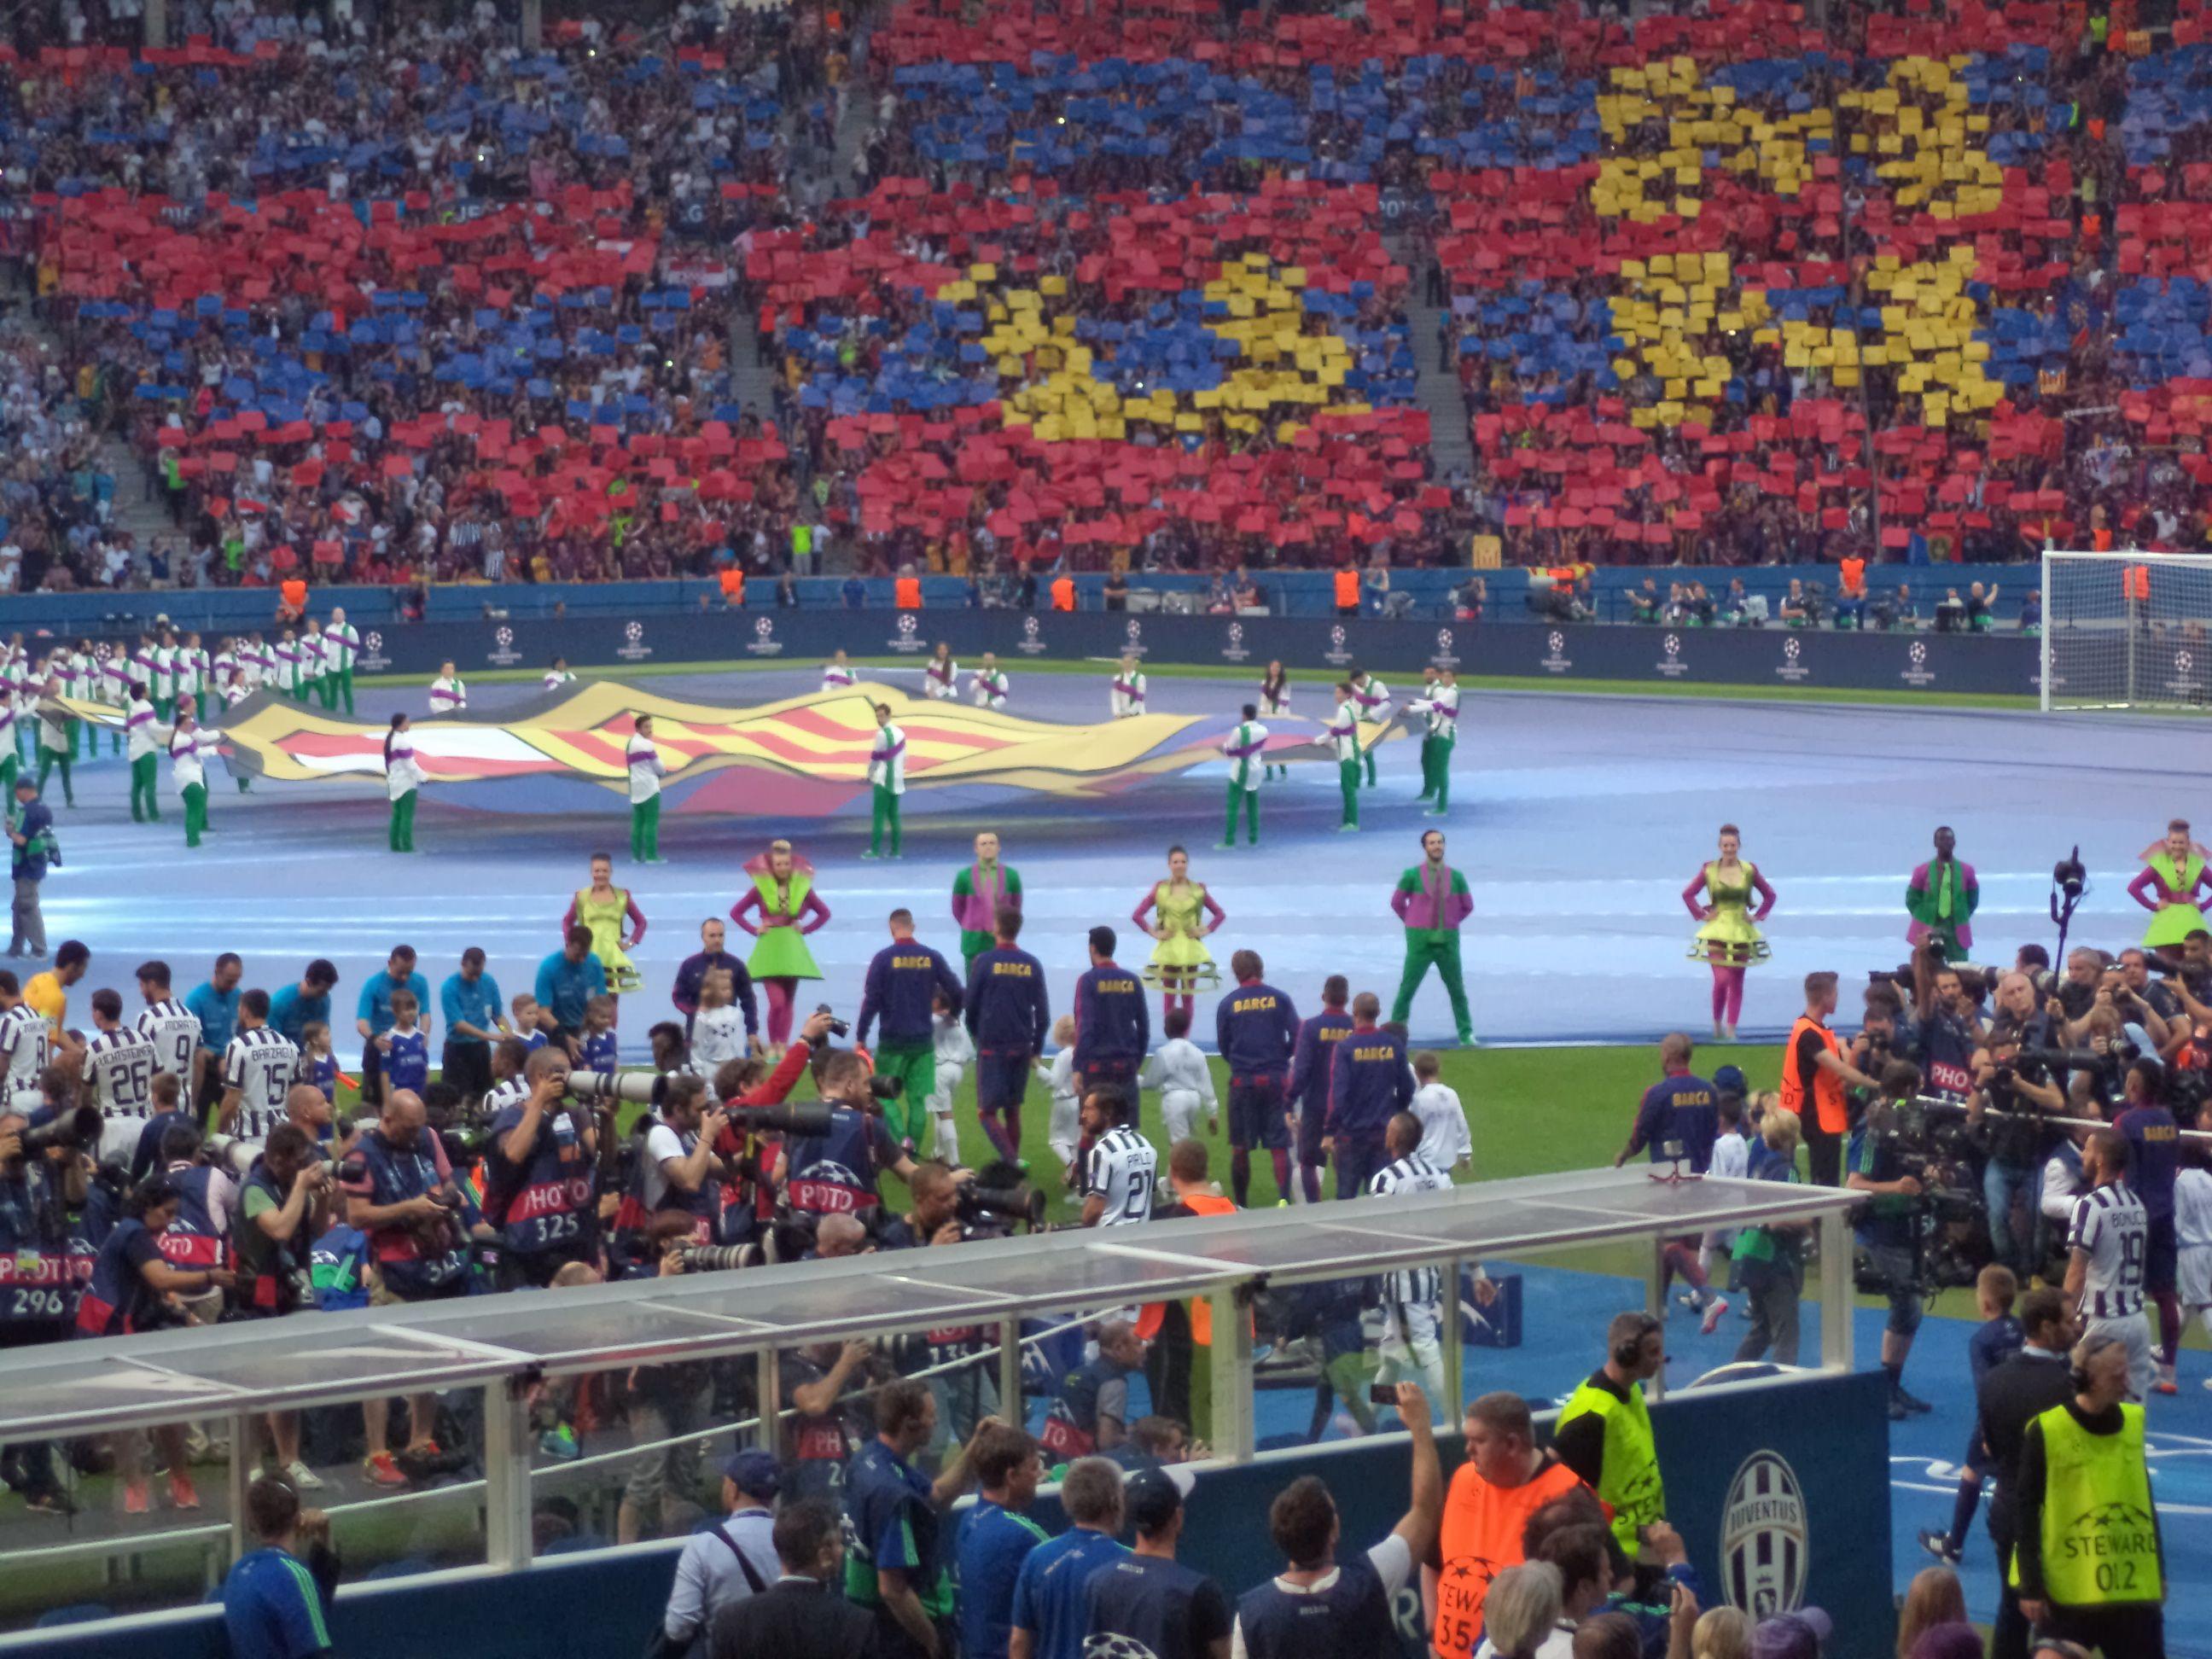 Pin by Veselin Rusinov on UEFA Champions League Final 2015 ...